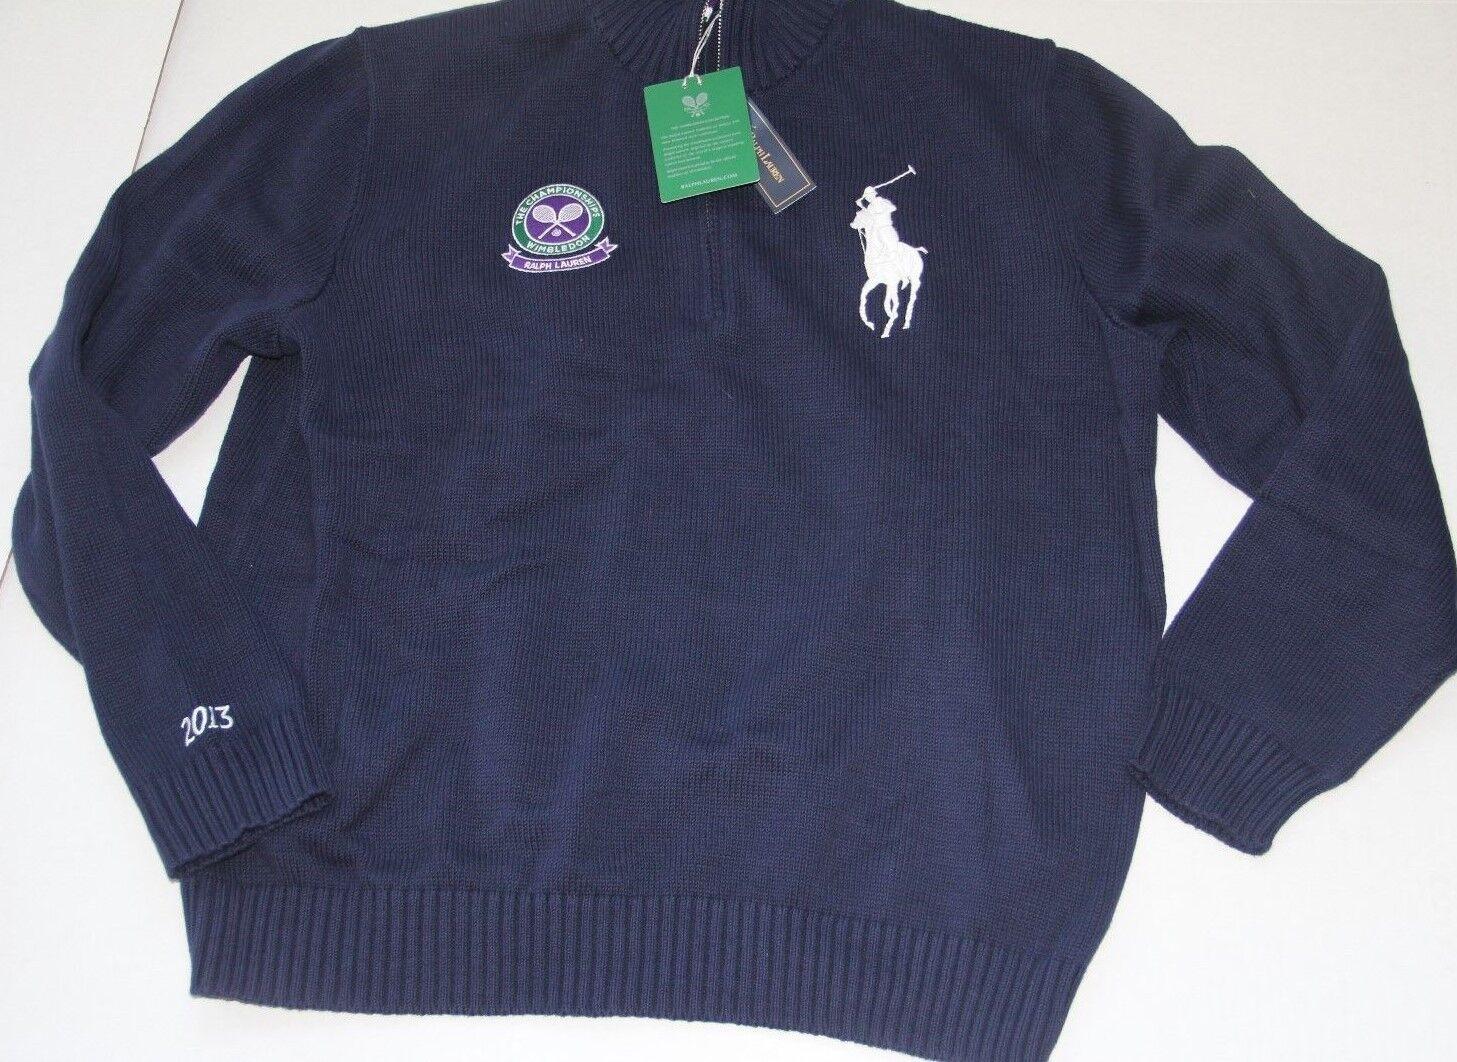 Ralph Lauren Polo Navy BLue Big Pony Wimbildon 2013 Half Zip Sweater XLarge  XL